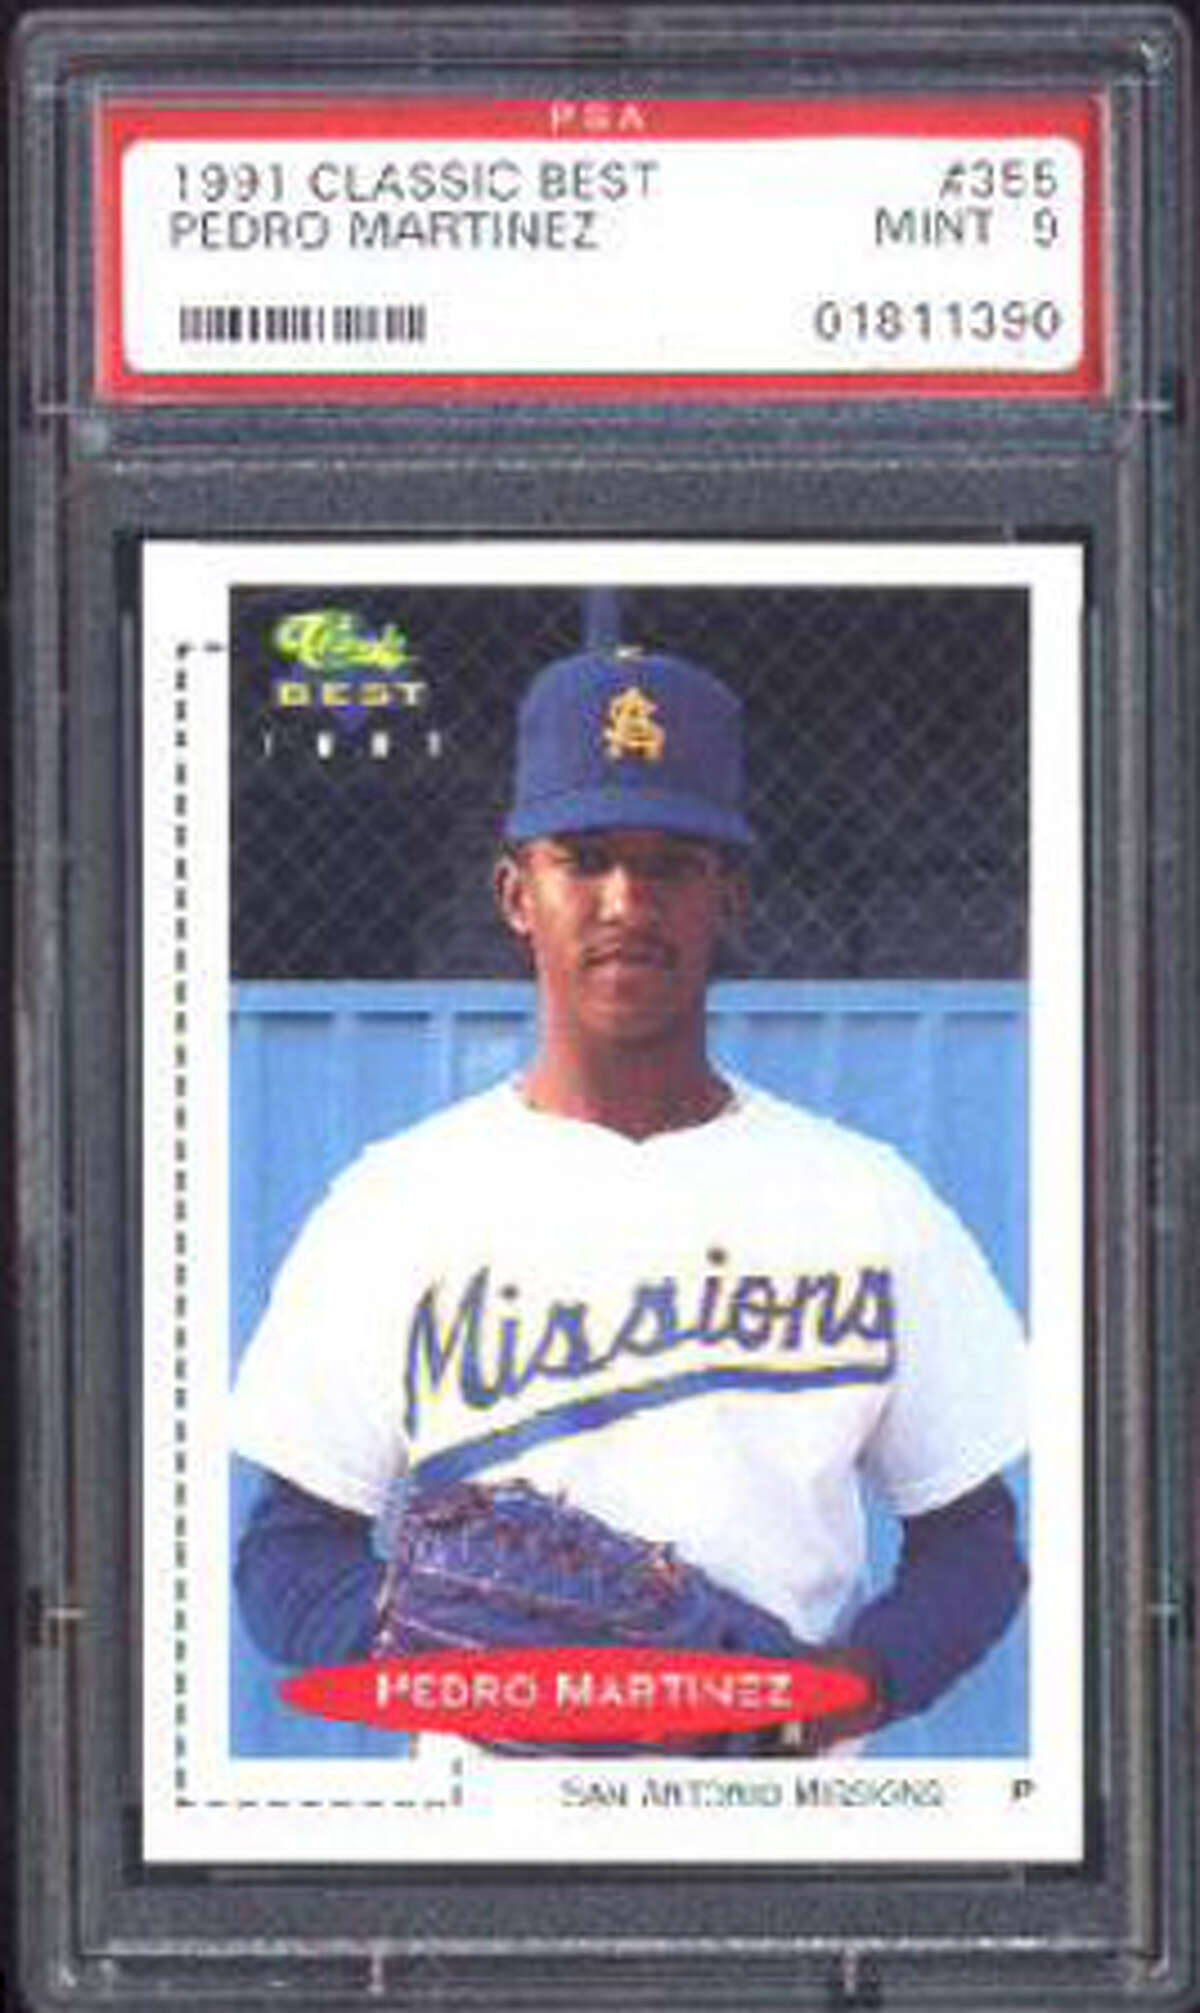 A 1991 baseball card of San Antonio Missions pitcher Pedro Martinez.